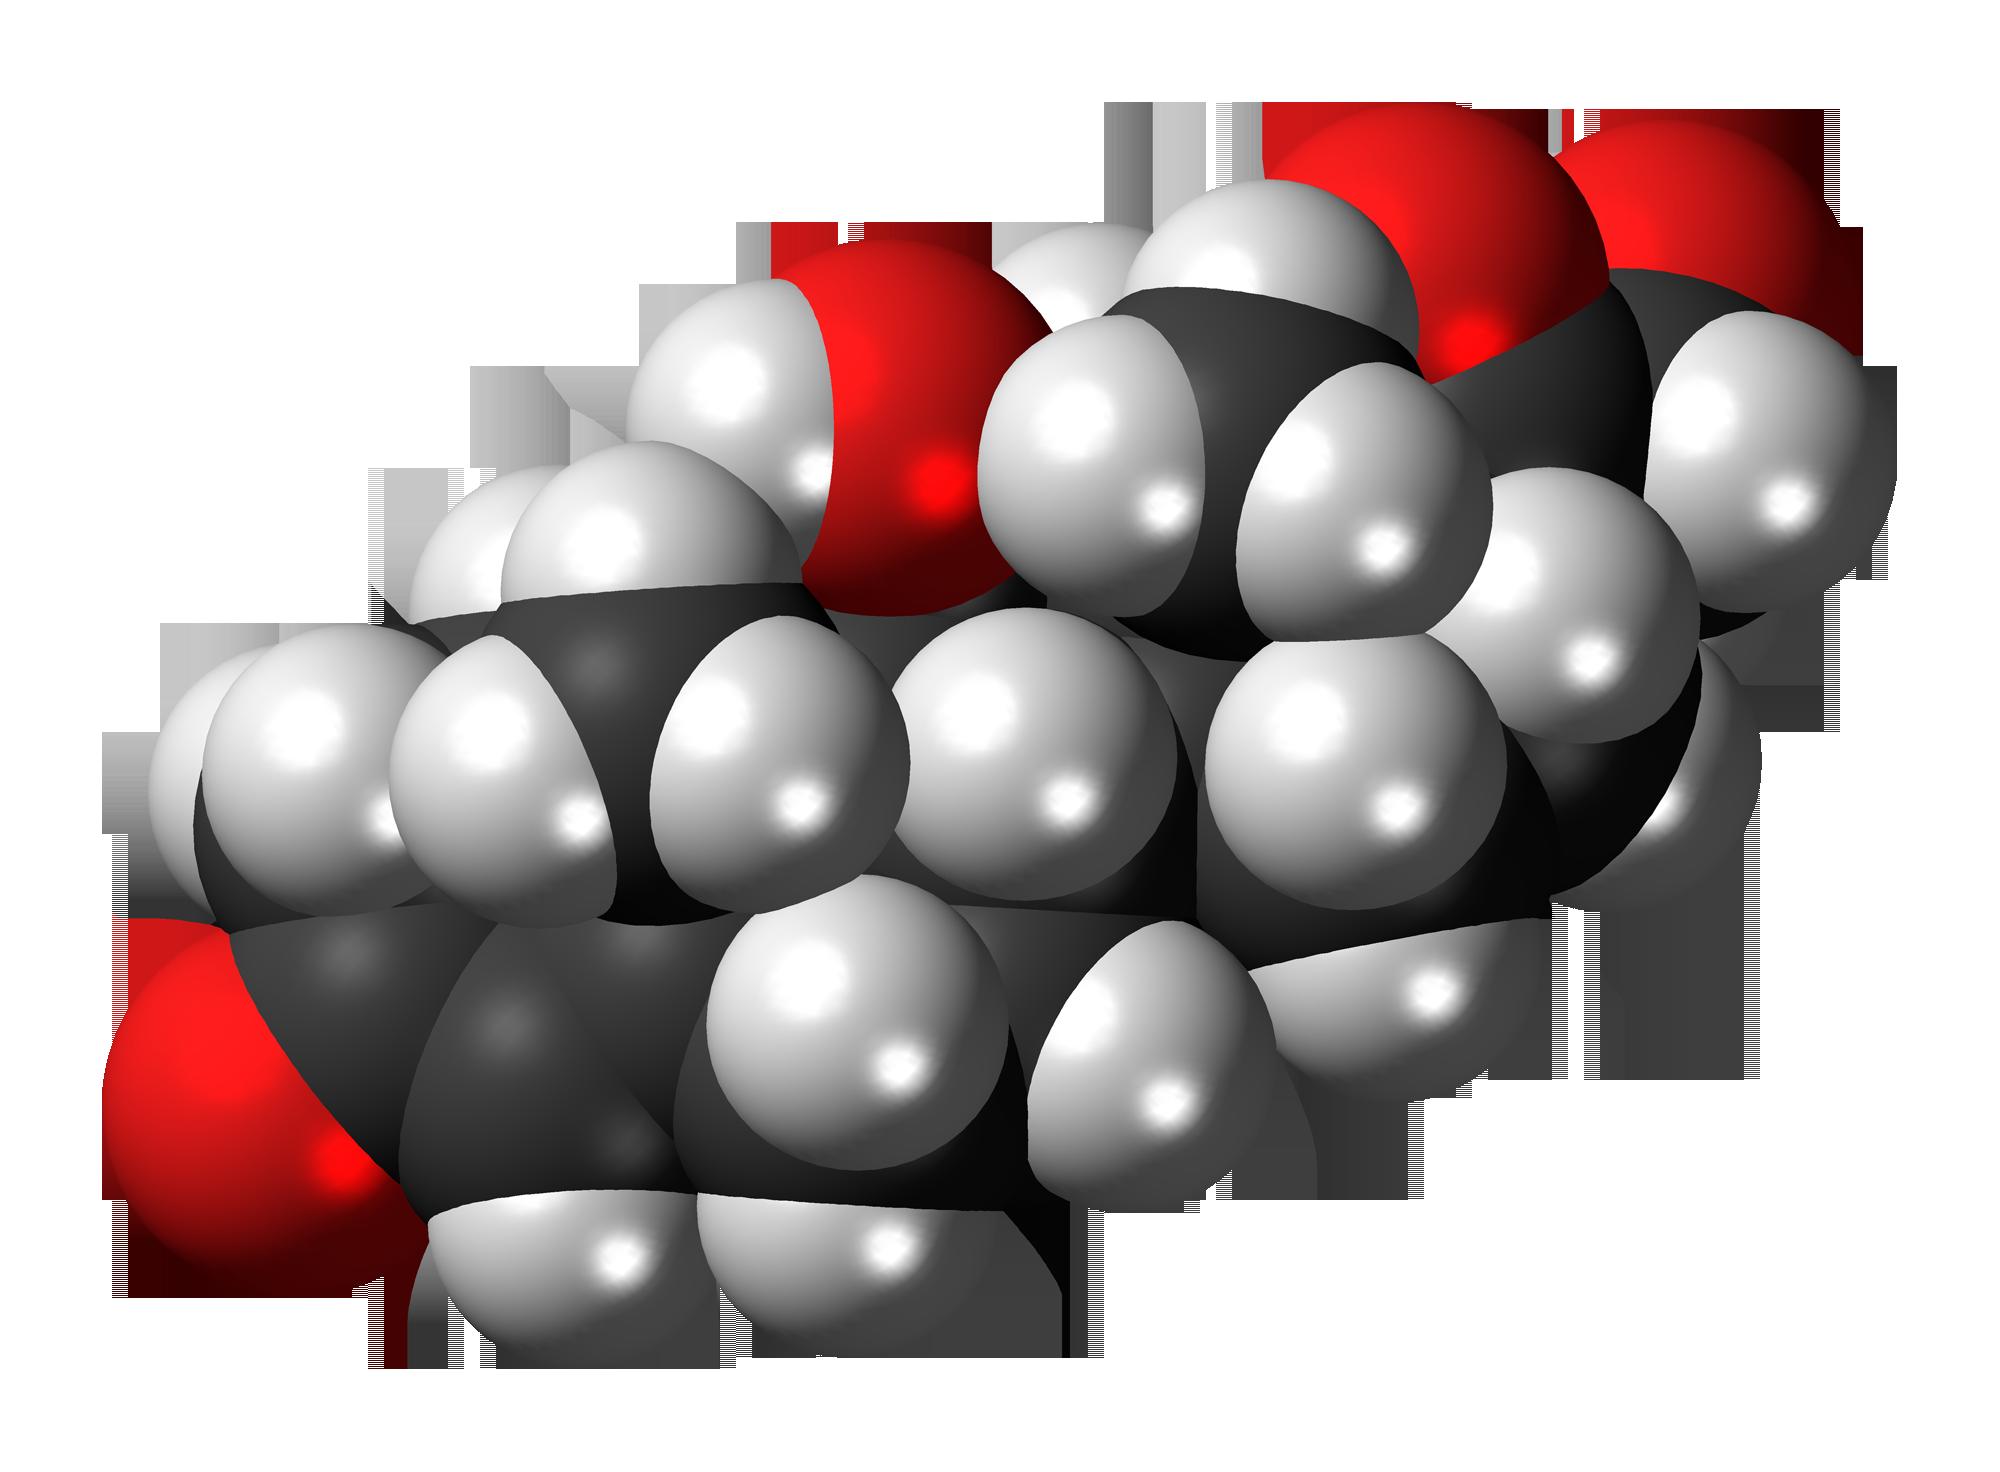 d ball steroid wiki